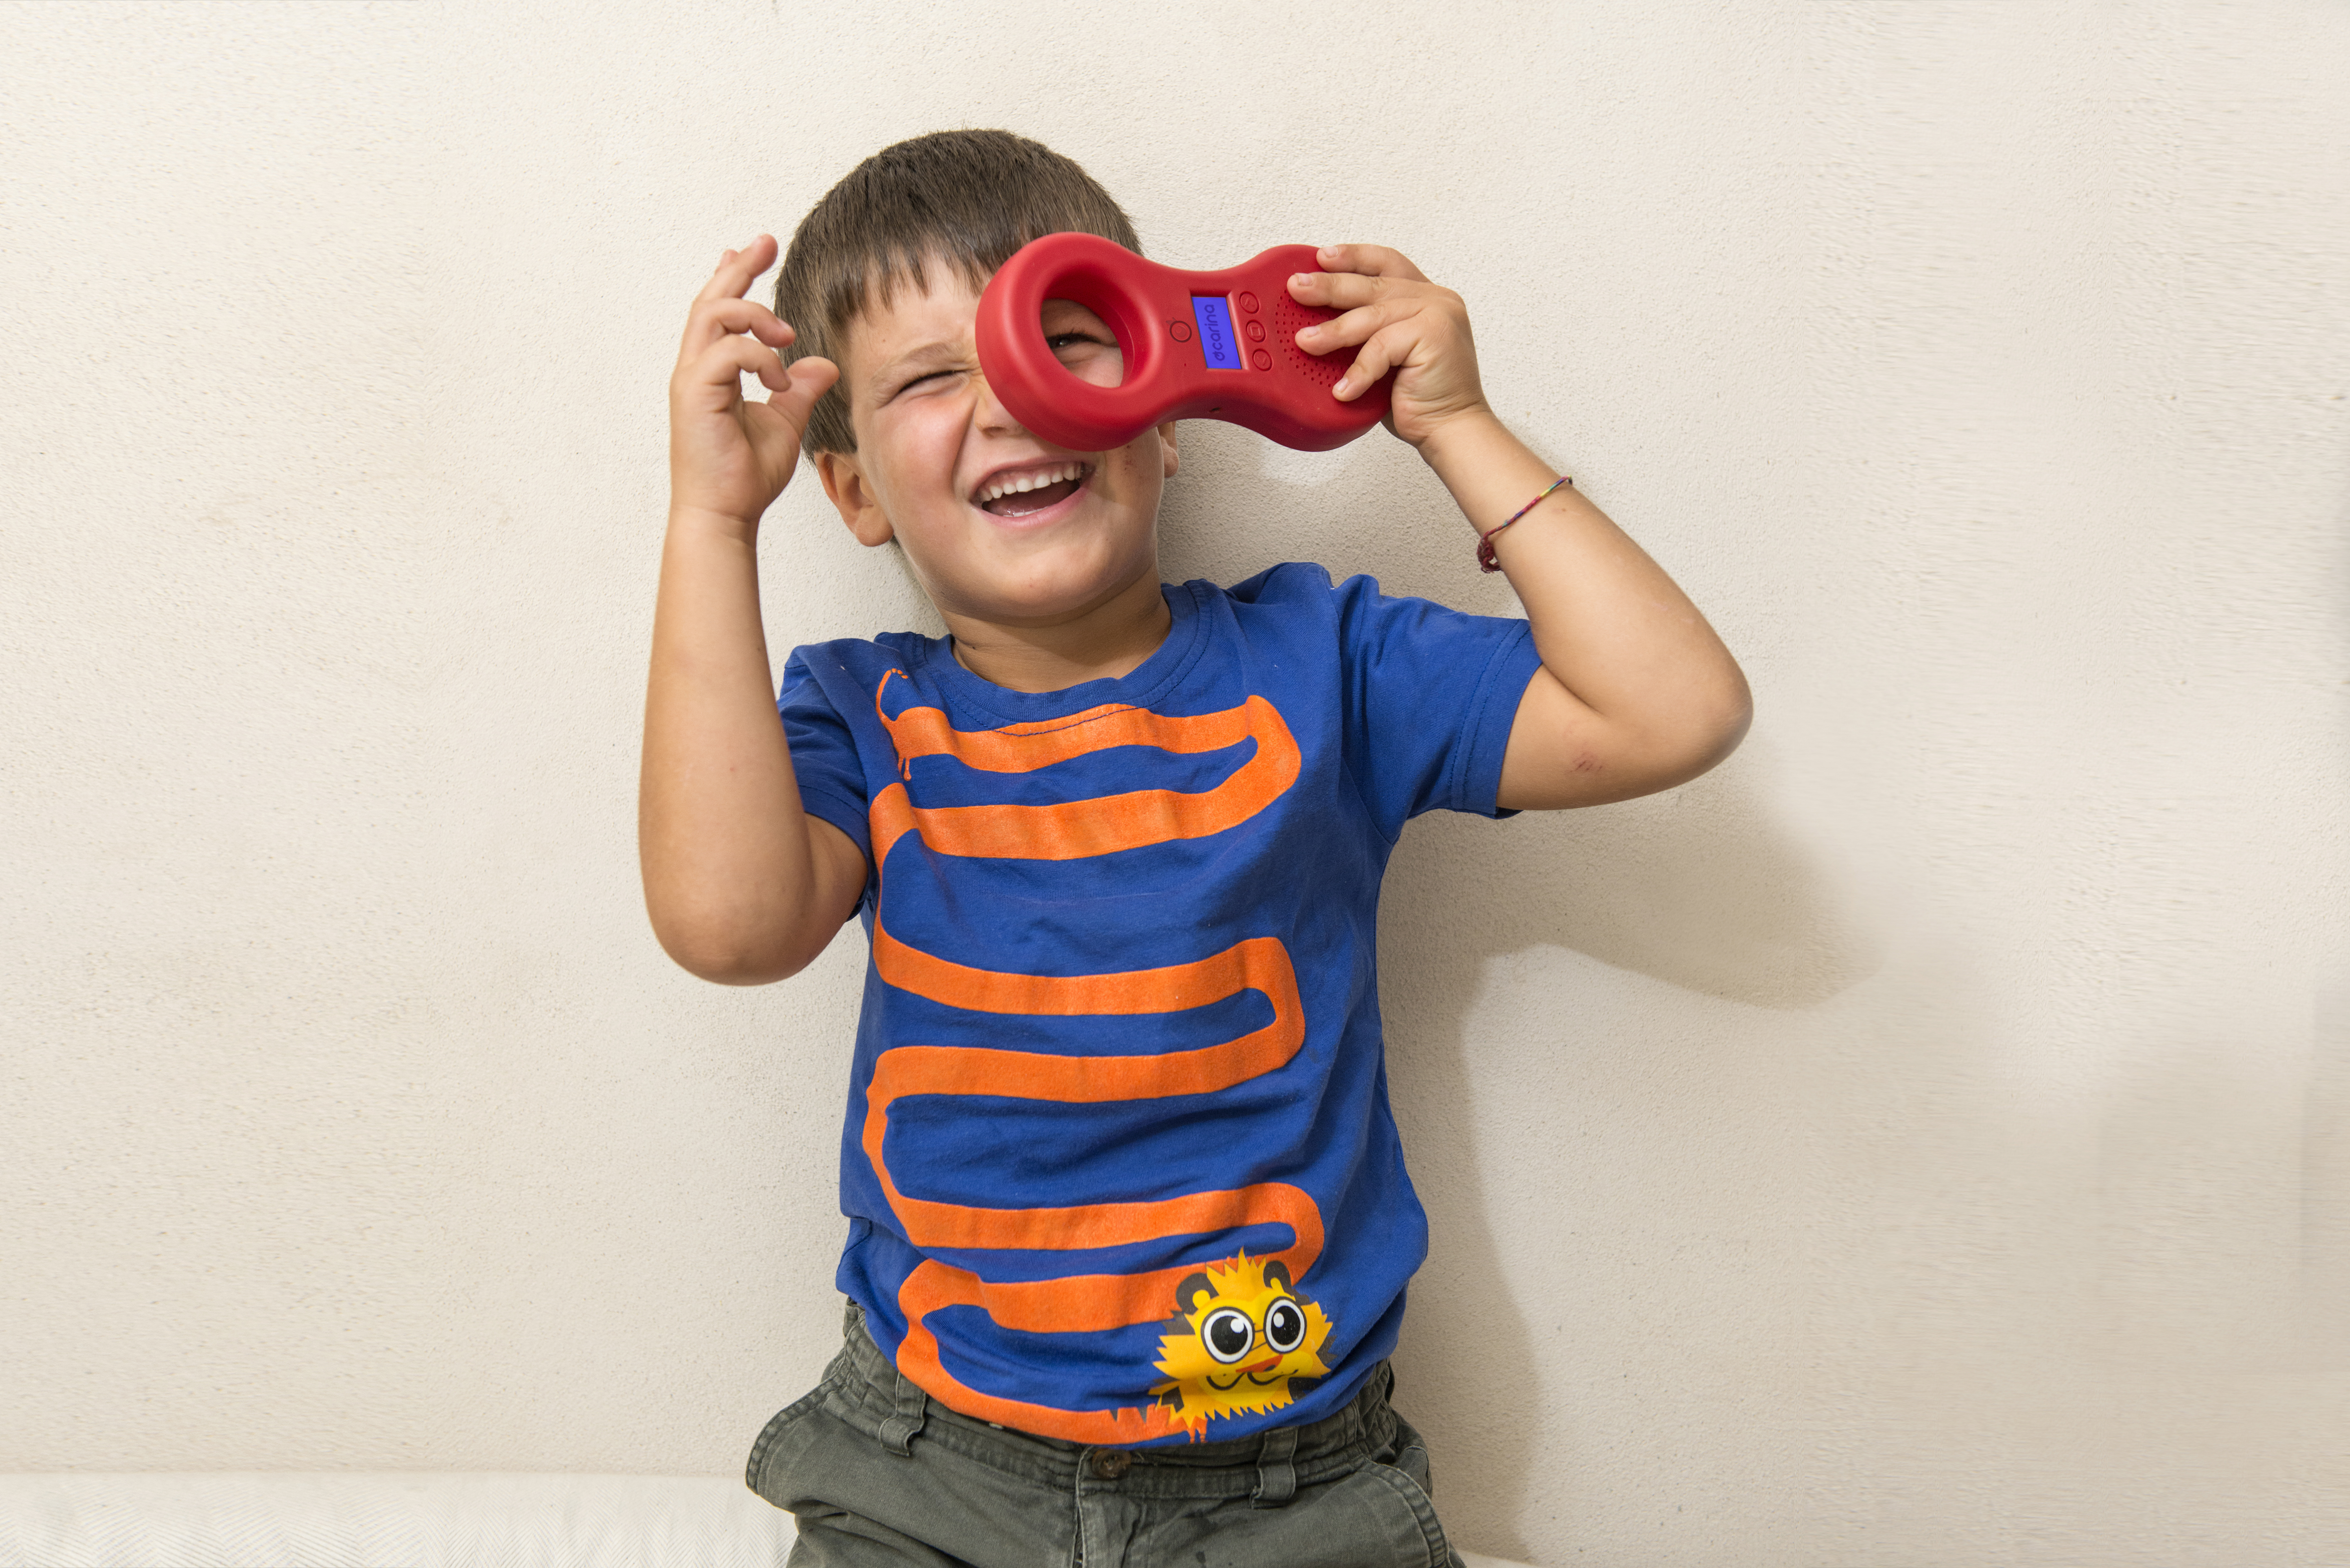 Ocarina Music Player lettroe mp3 bambini